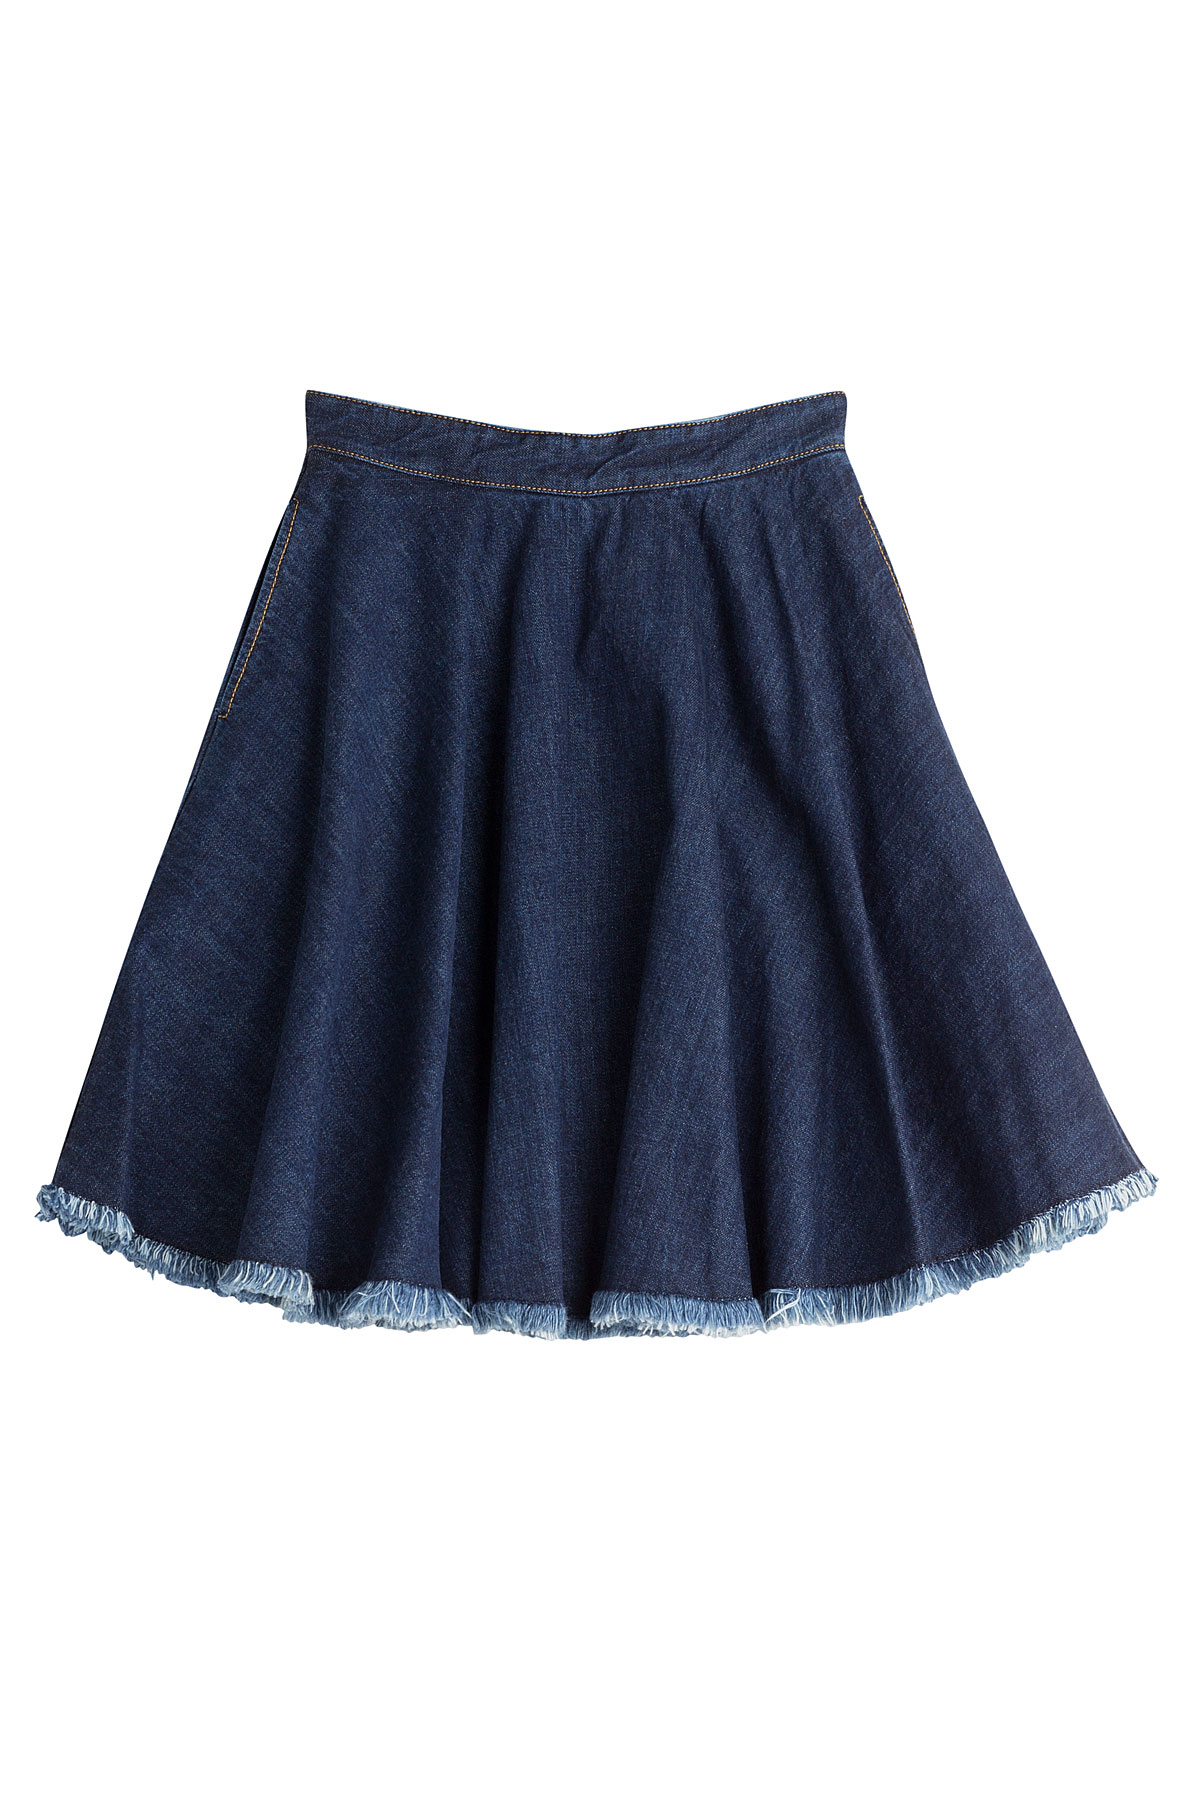 msgm denim skirt blue in blue lyst